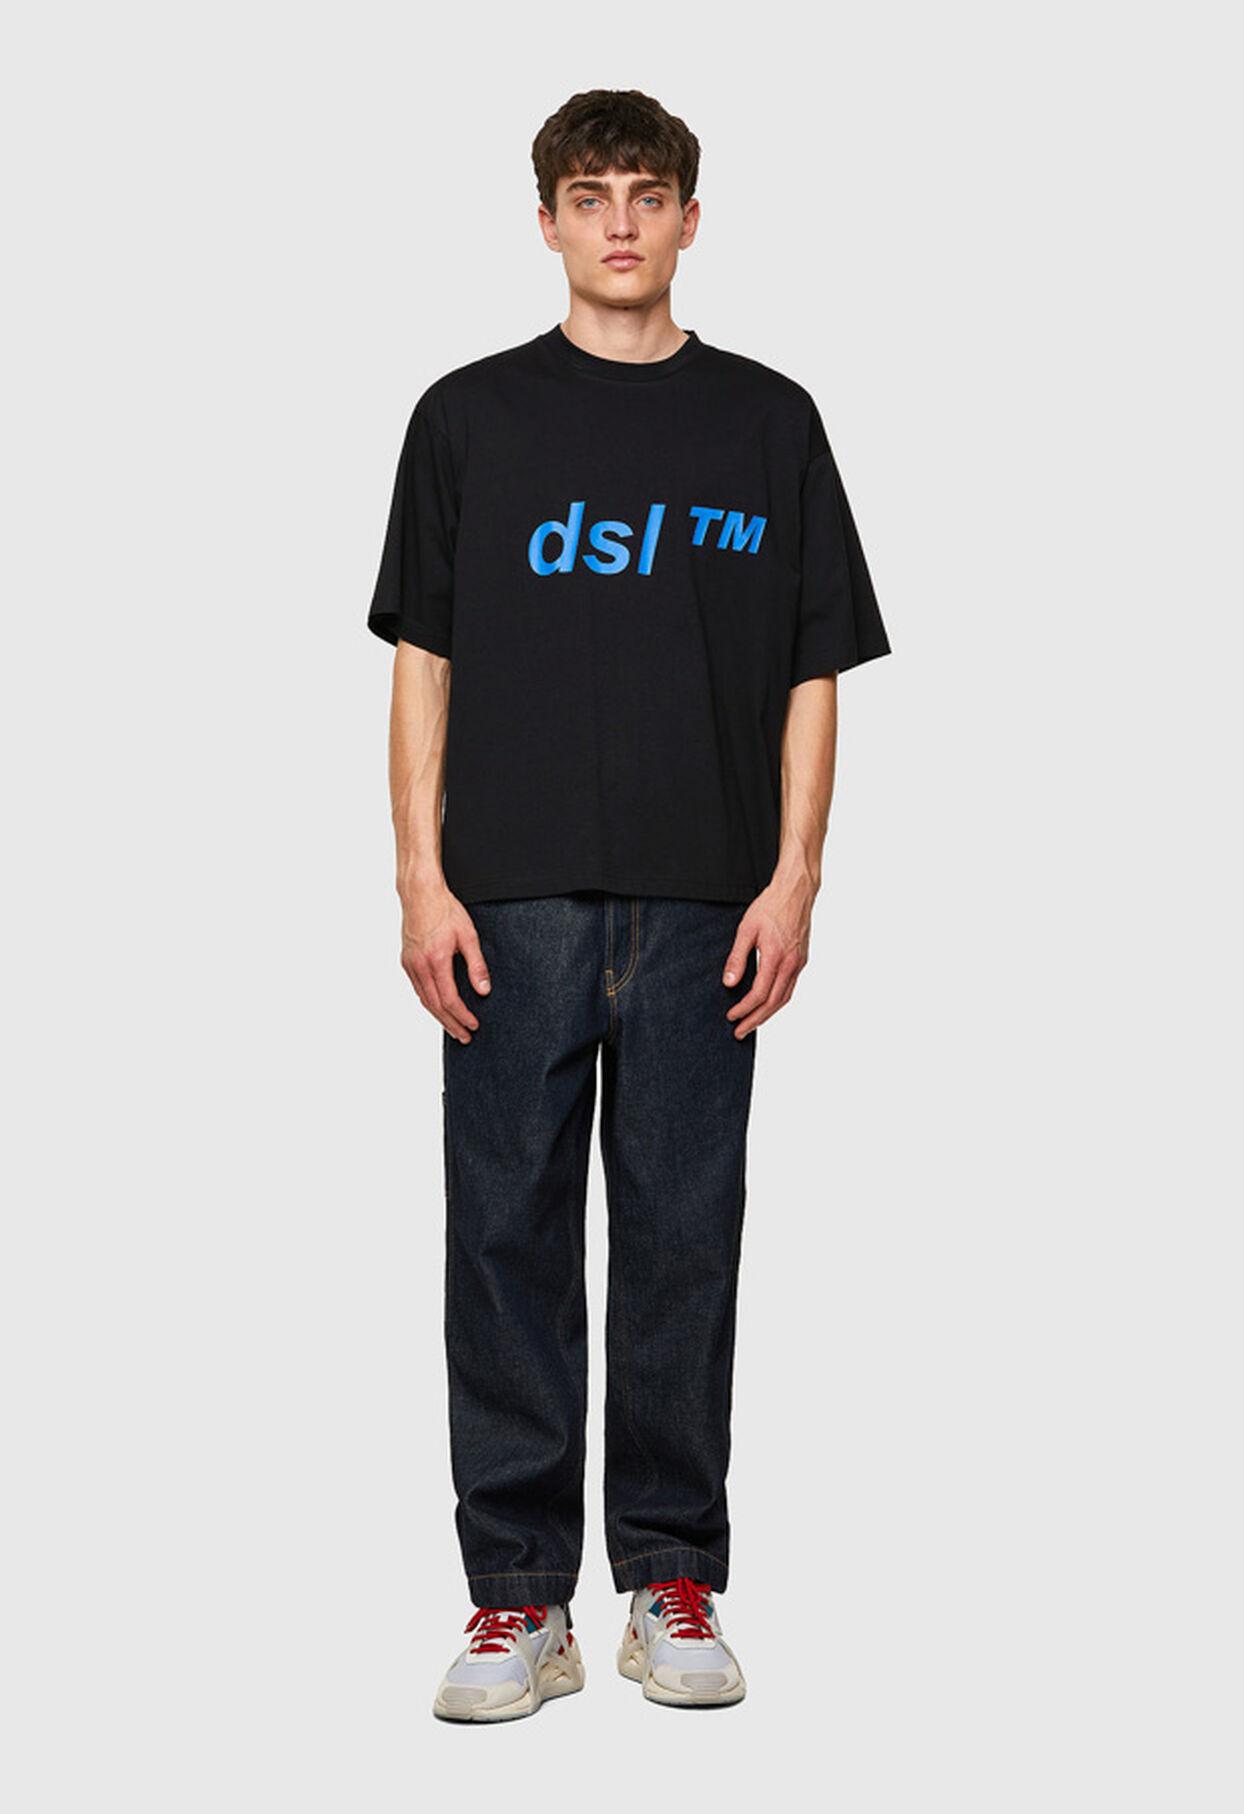 https://lt.diesel.com/dw/image/v2/BBLG_PRD/on/demandware.static/-/Library-Sites-DieselMFSharedLibrary/default/dwc2b2d1f7/CATEGORYOV/2x2_t-balm_A02798_0HAYU_9XX_C.jpg?sw=1244&sh=1814